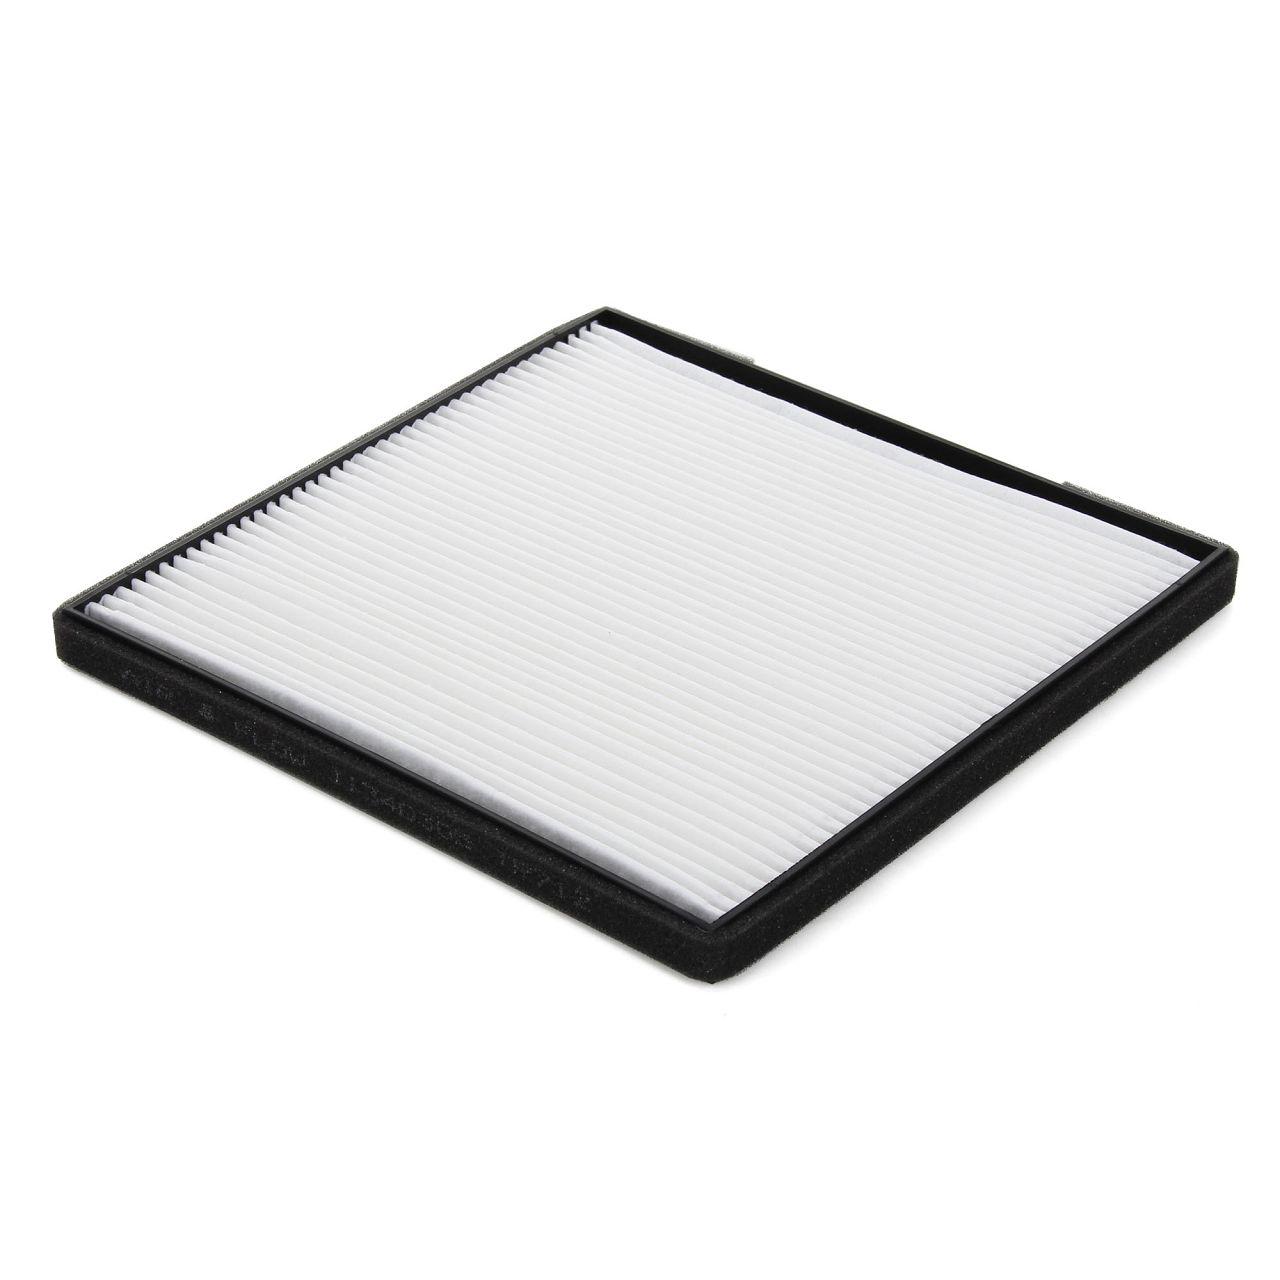 HERTH+BUSS JAKOPARTS Filterpaket Filterset für HYUNDAI i10 (PA) 1.1 CRDi 75 PS